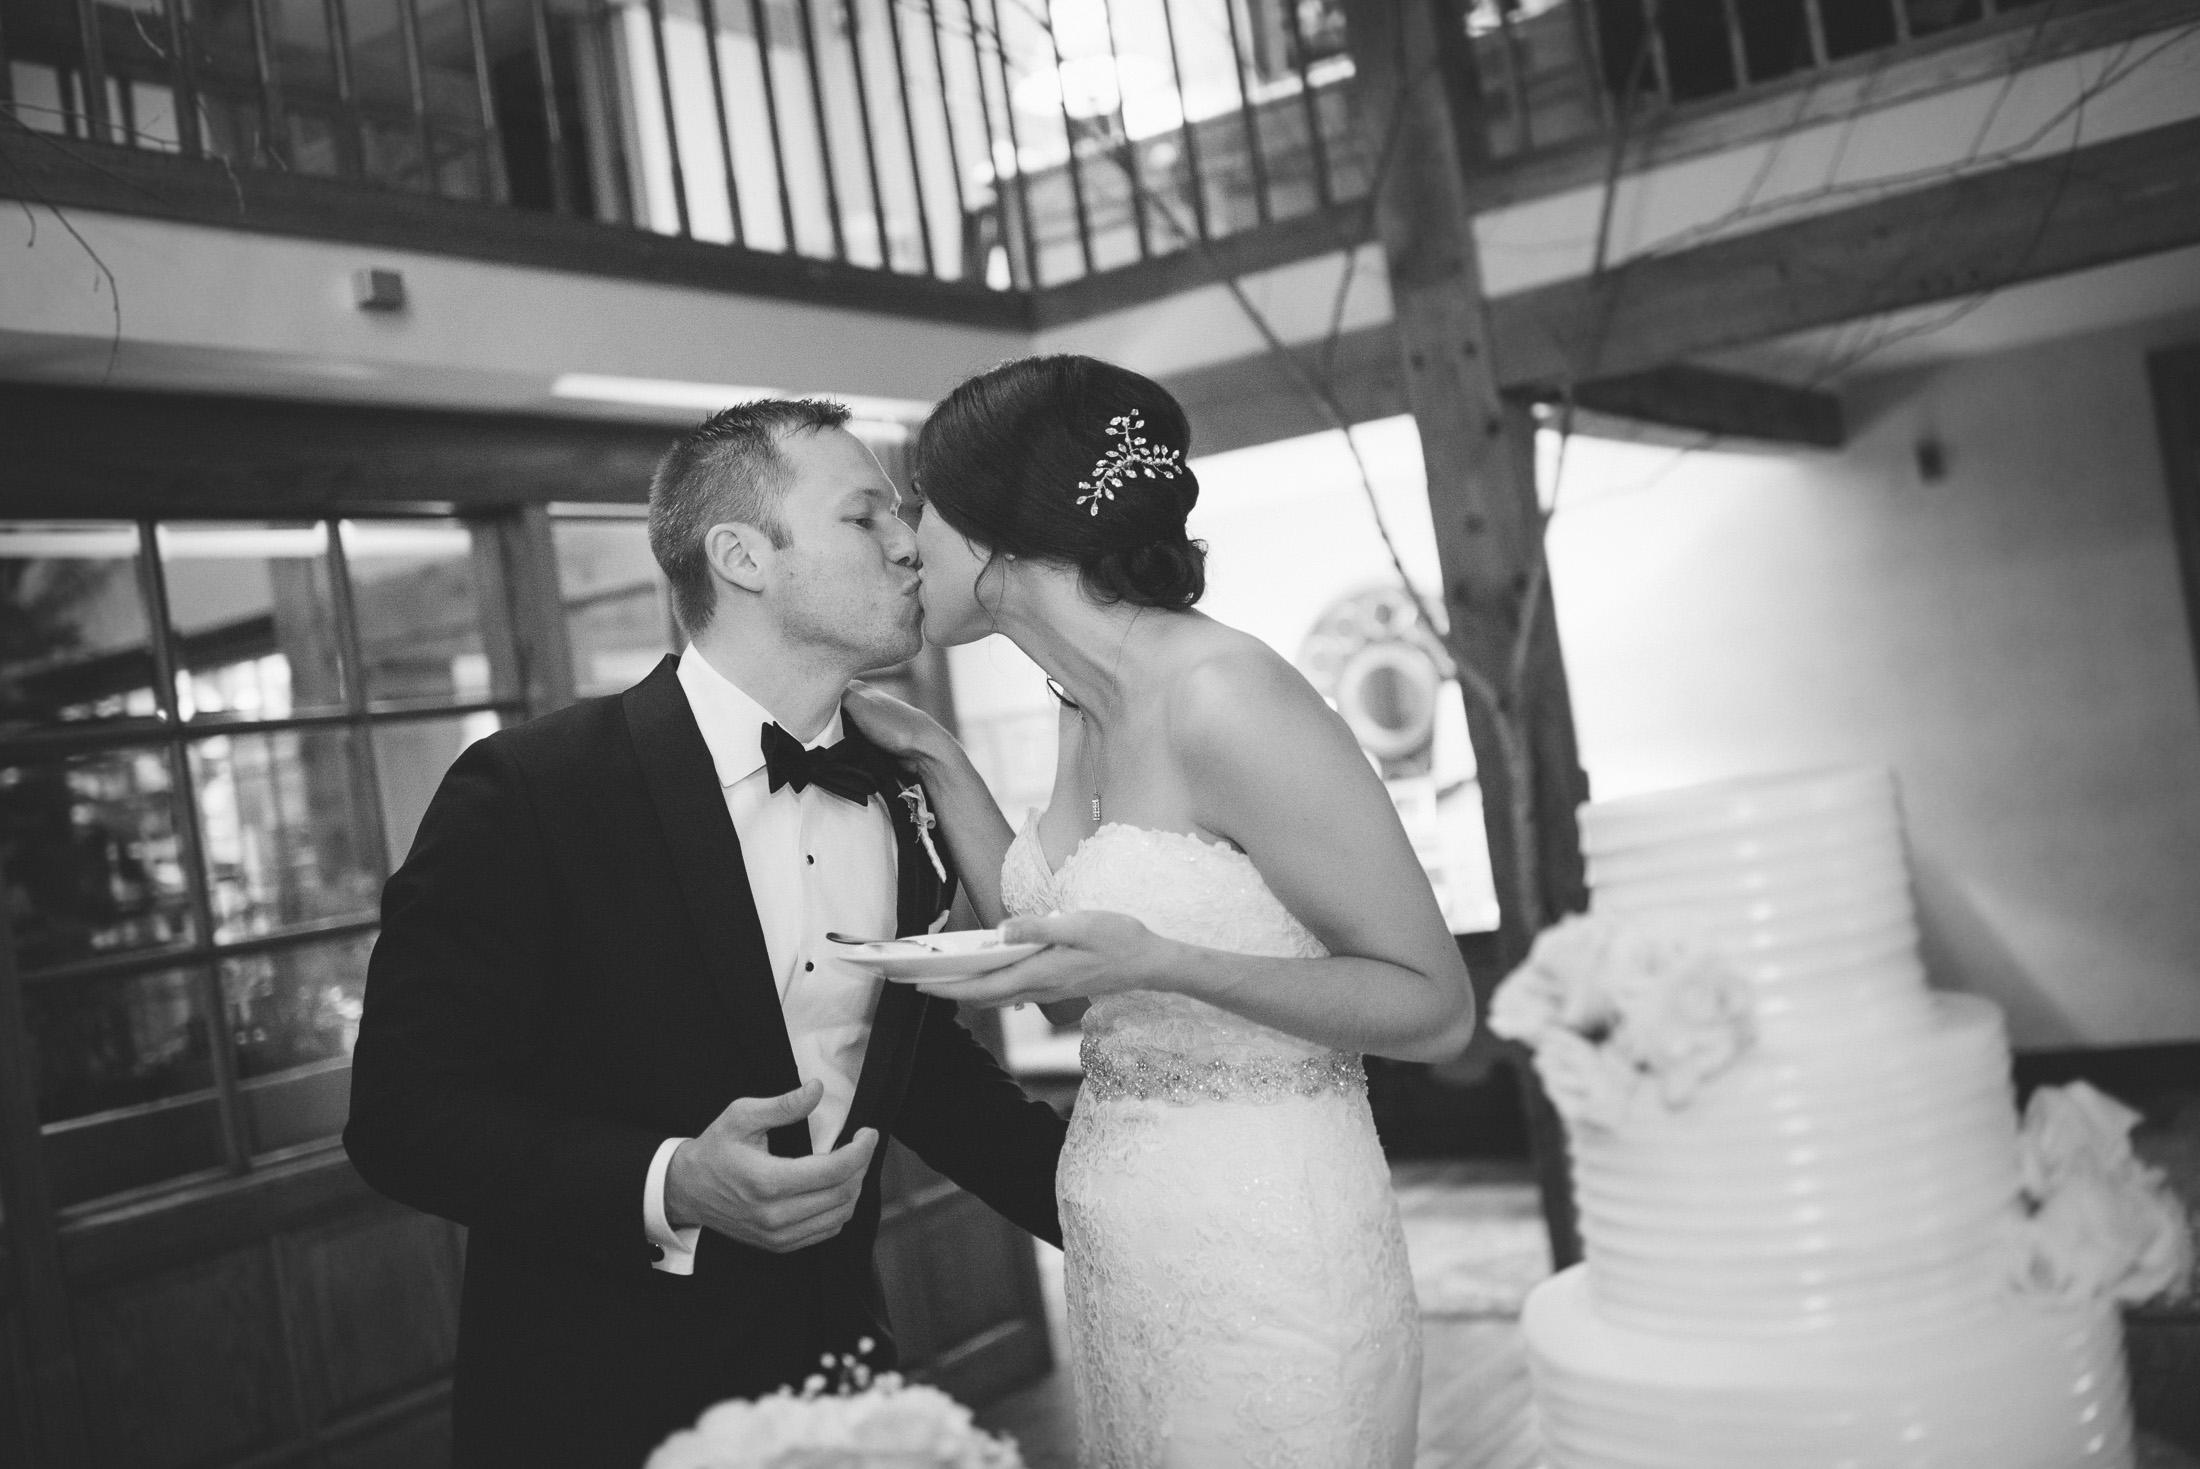 NH Wedding Photographer: reception bride and groom